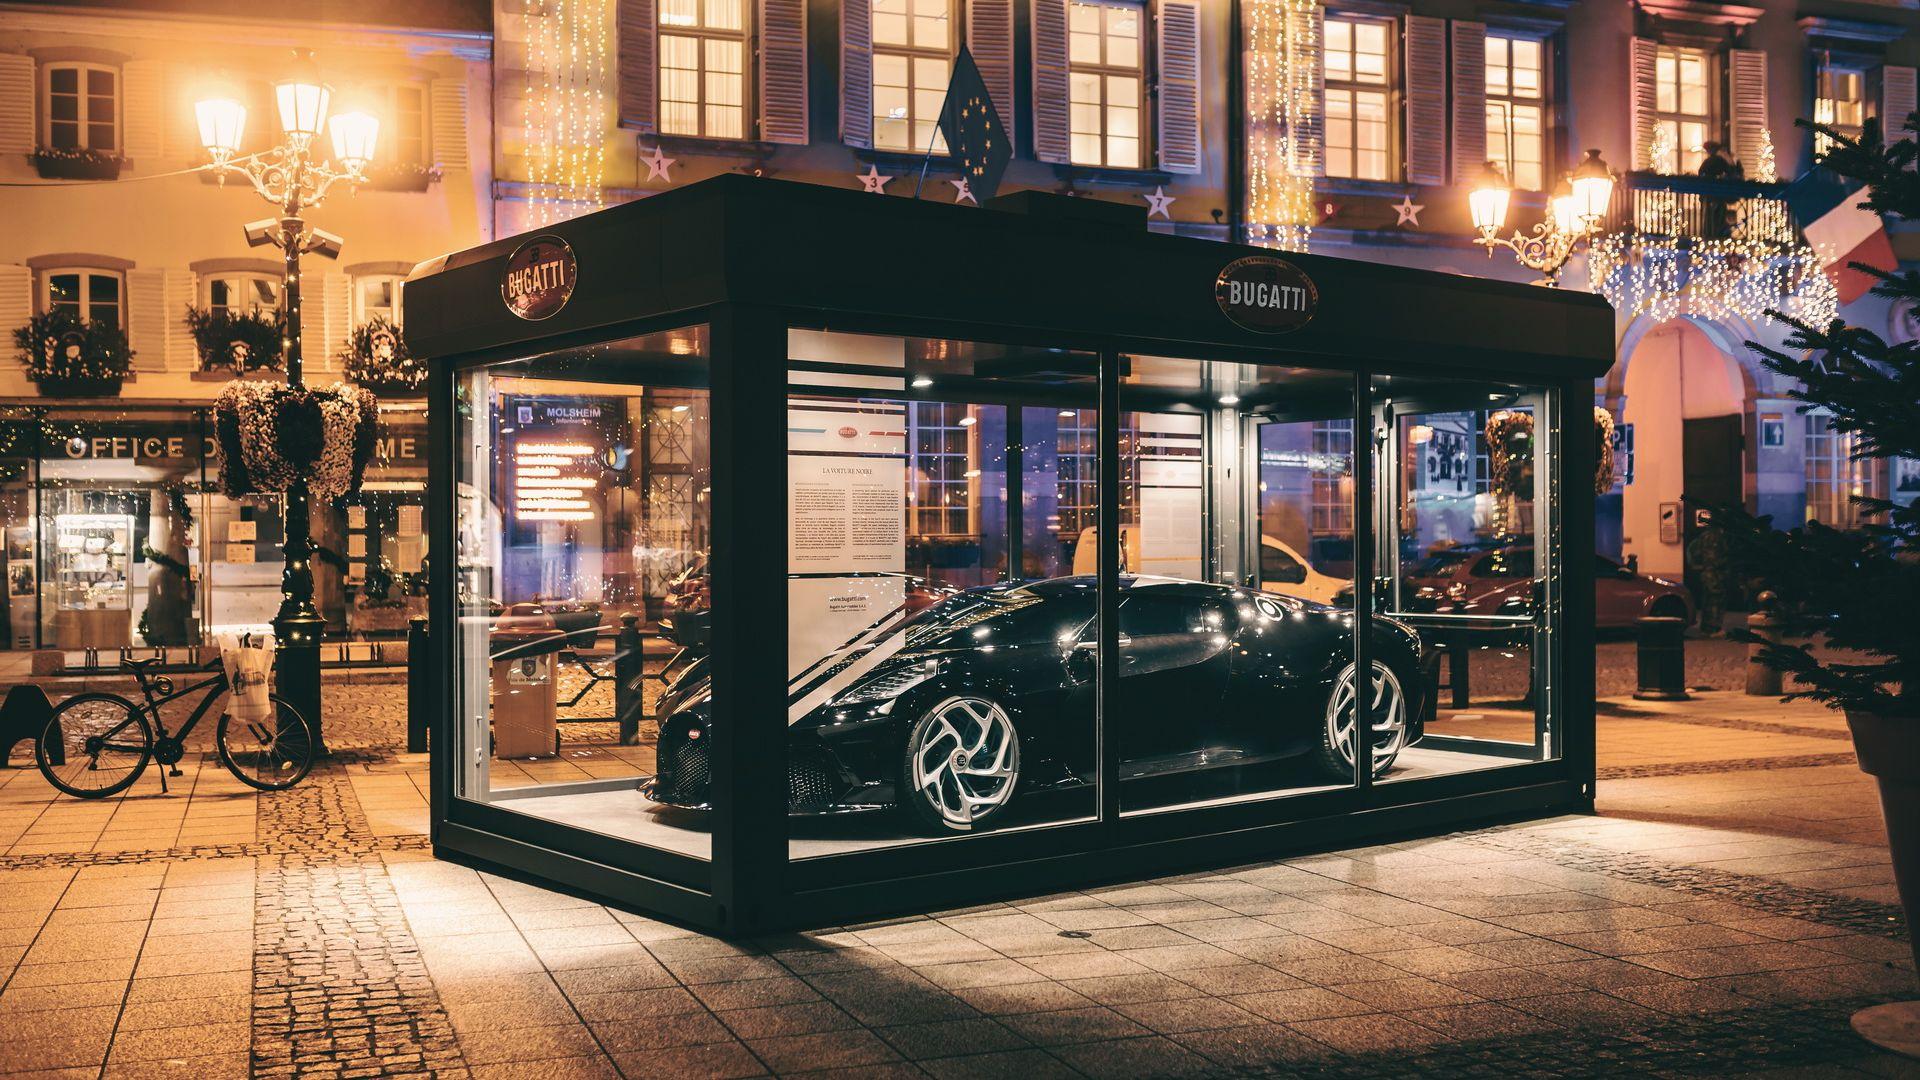 Самая дорогая декорация на Рождество: стеклянный куб с Bugatti за 11 млн евро внутри